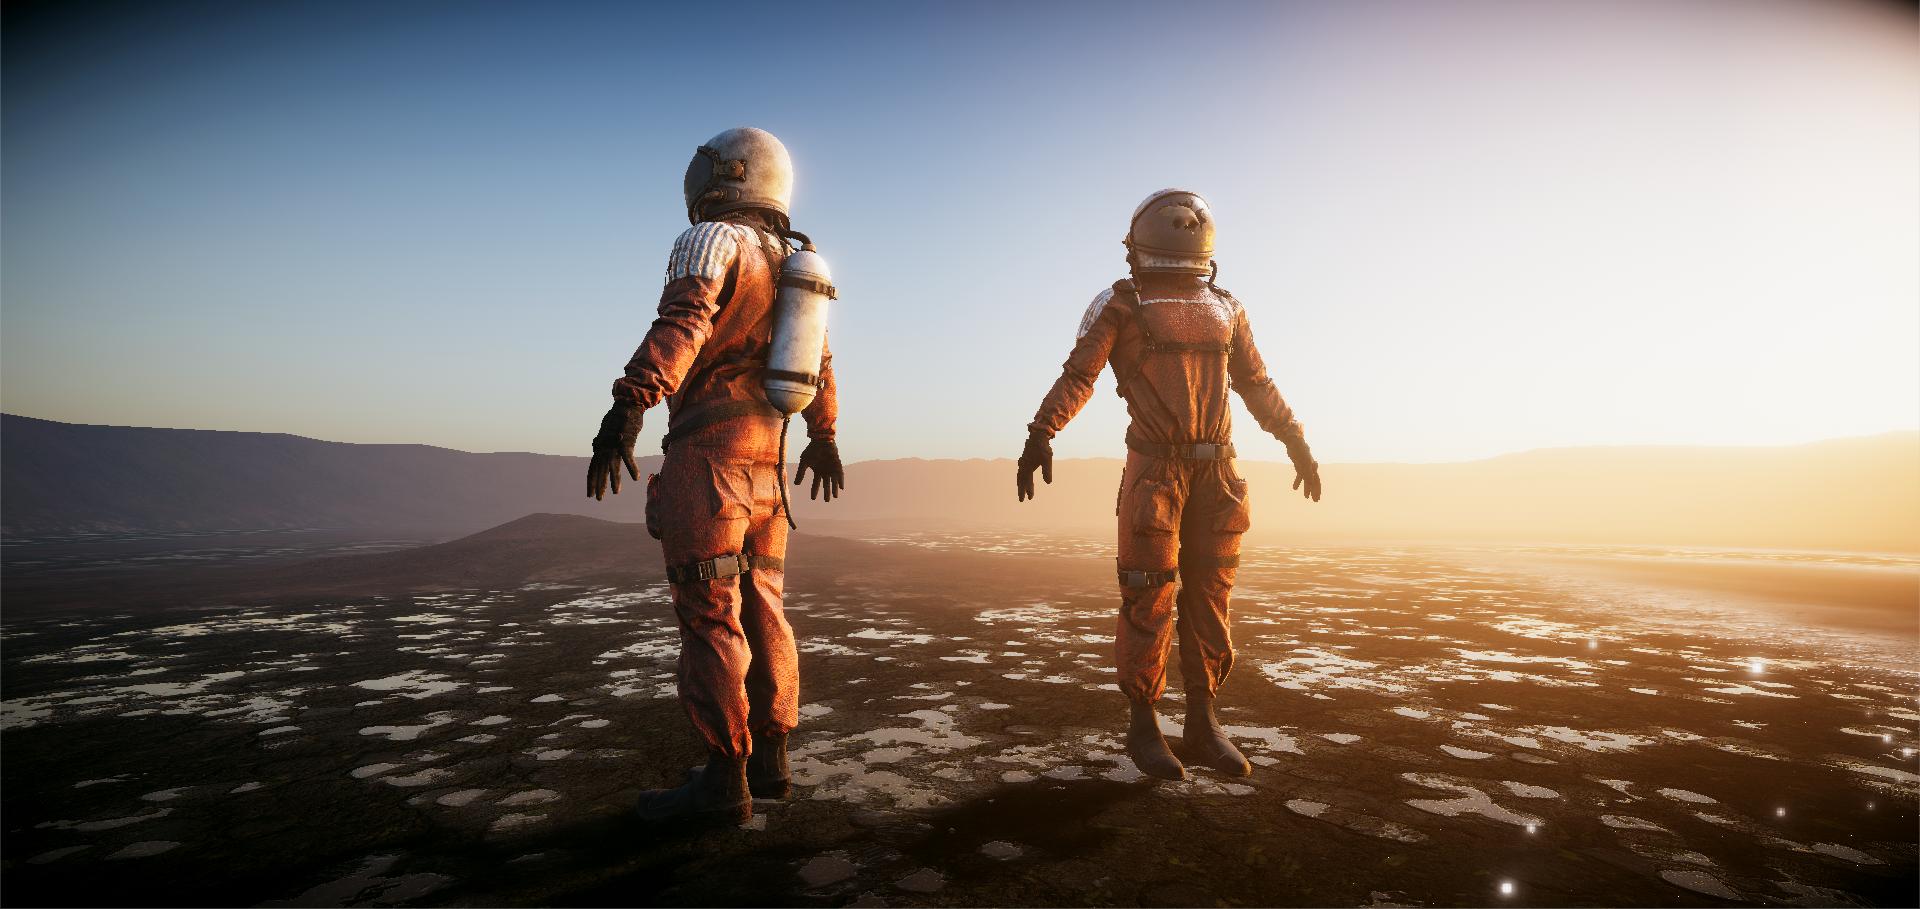 Lost Cosmonauts - Unity 5 HDRP